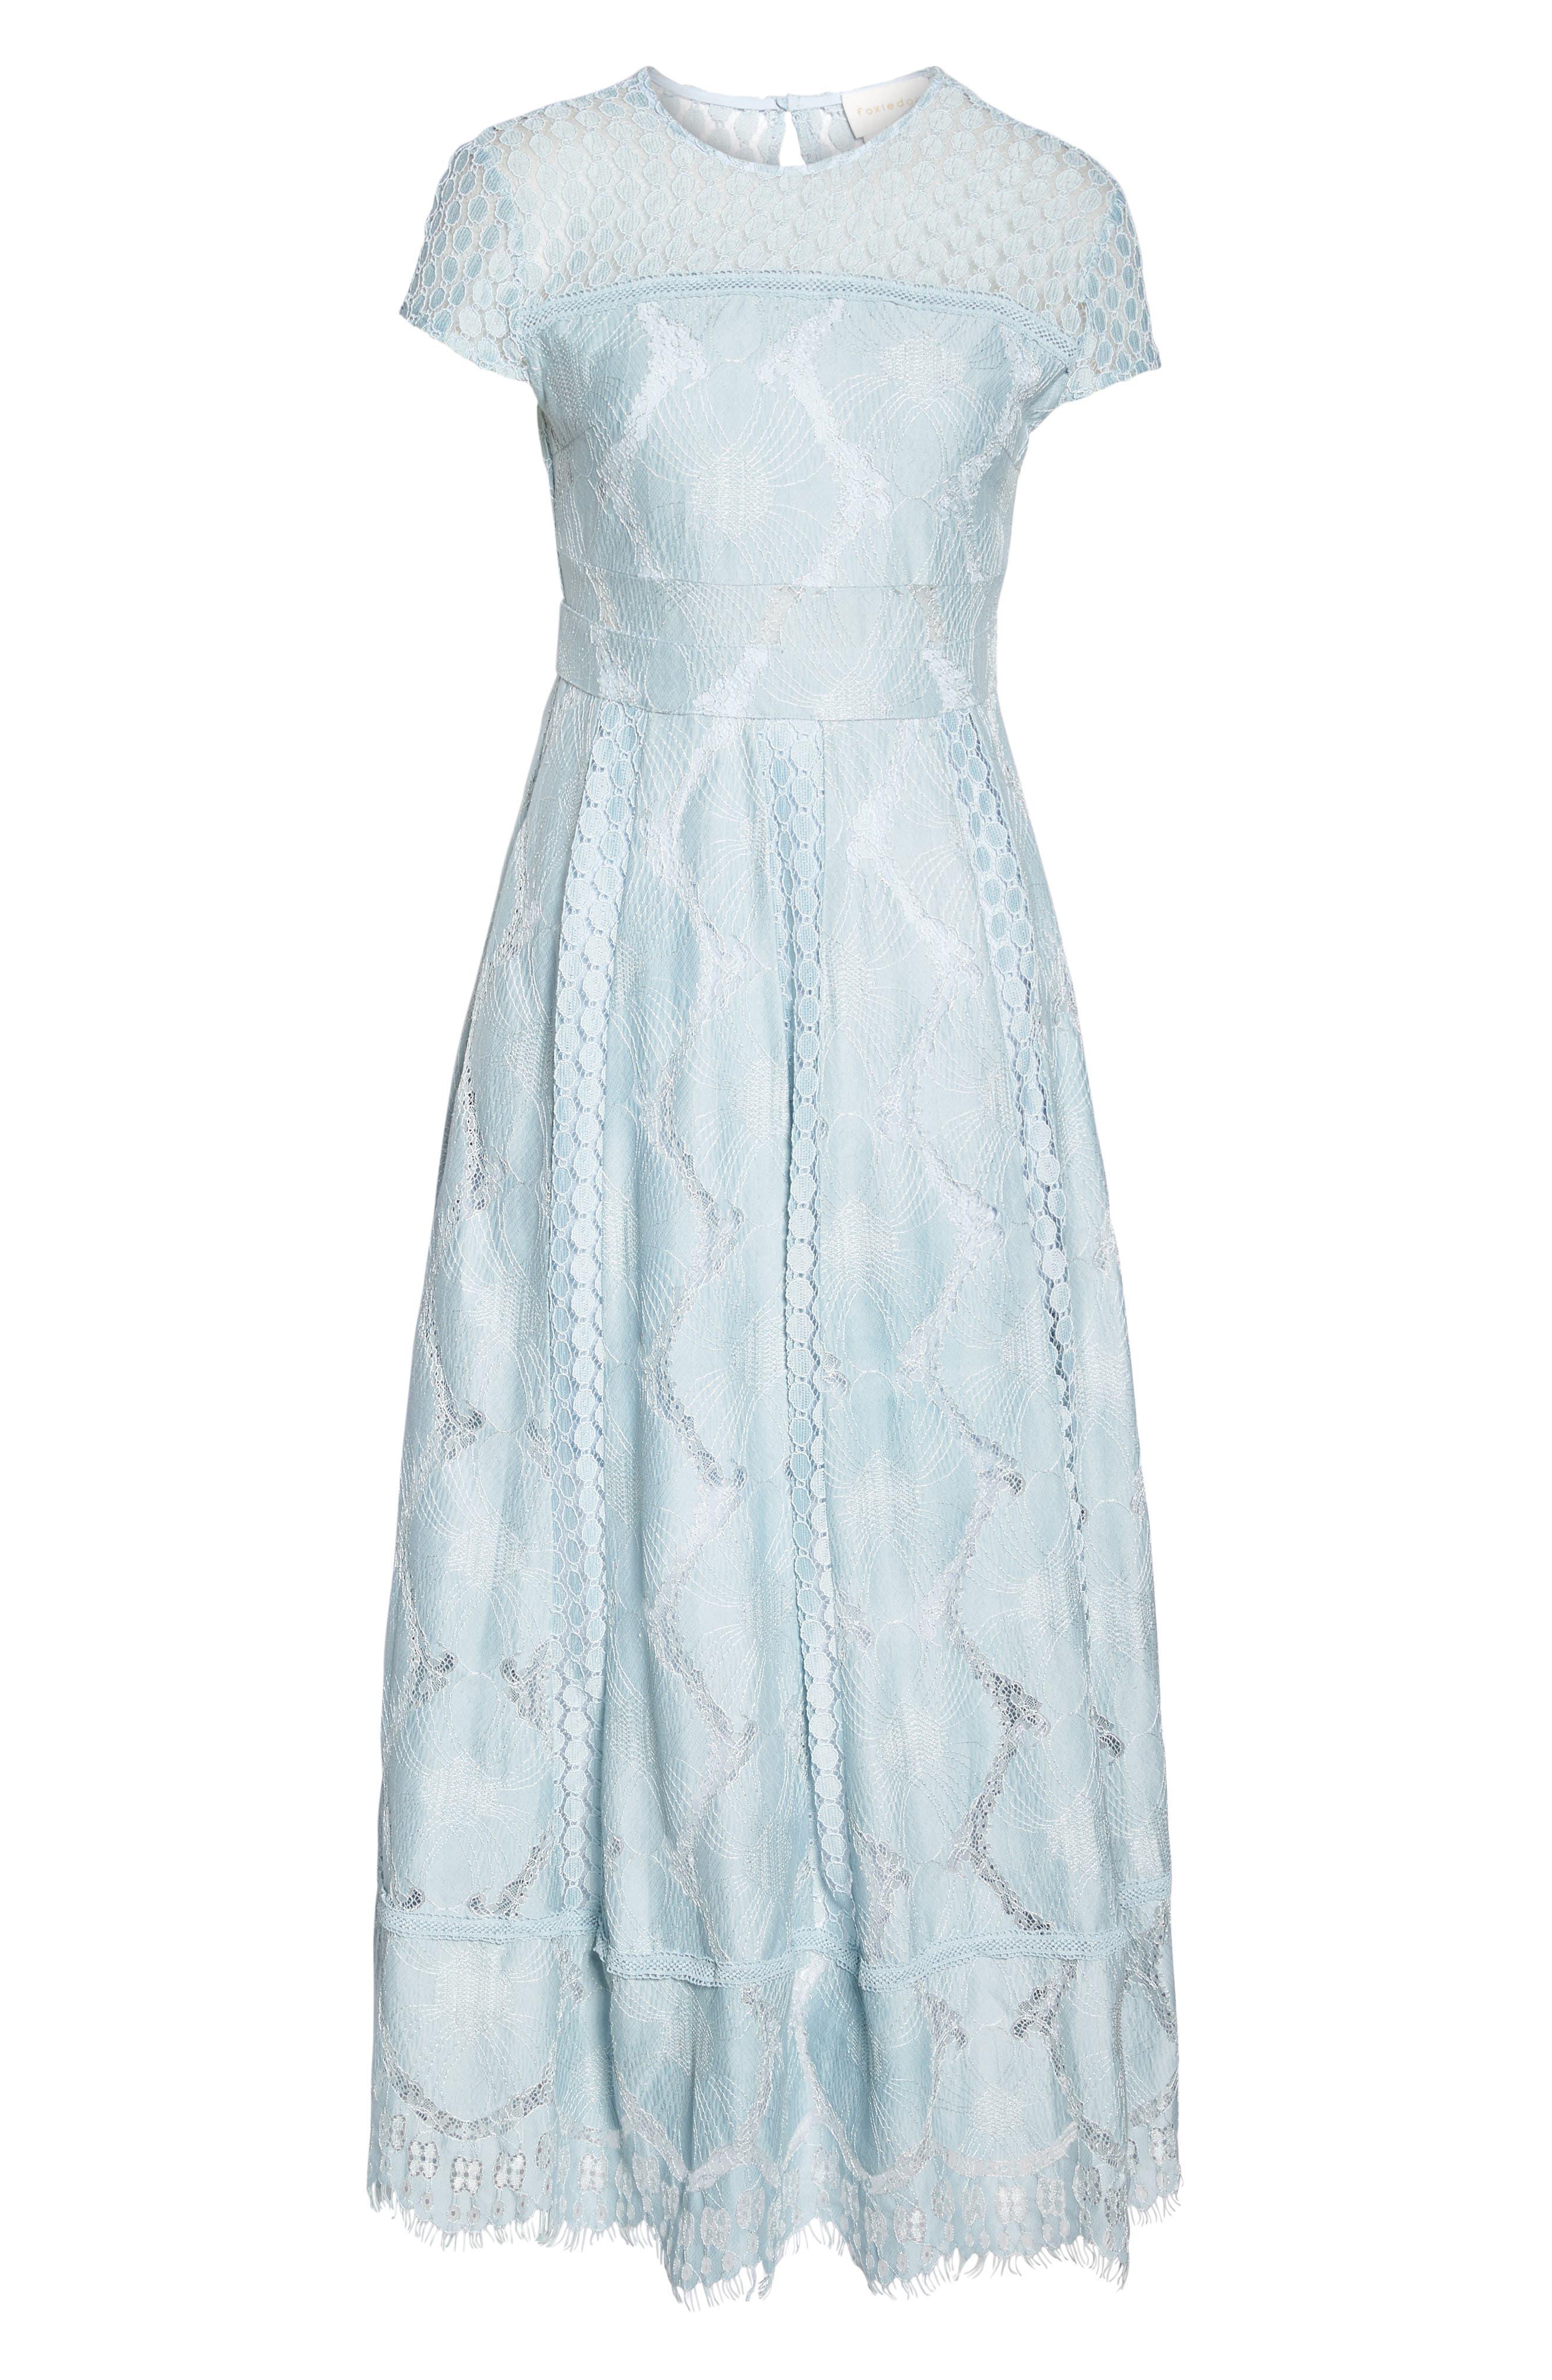 Theodora Lace Midi Dress,                             Alternate thumbnail 6, color,                             BLUEBELL